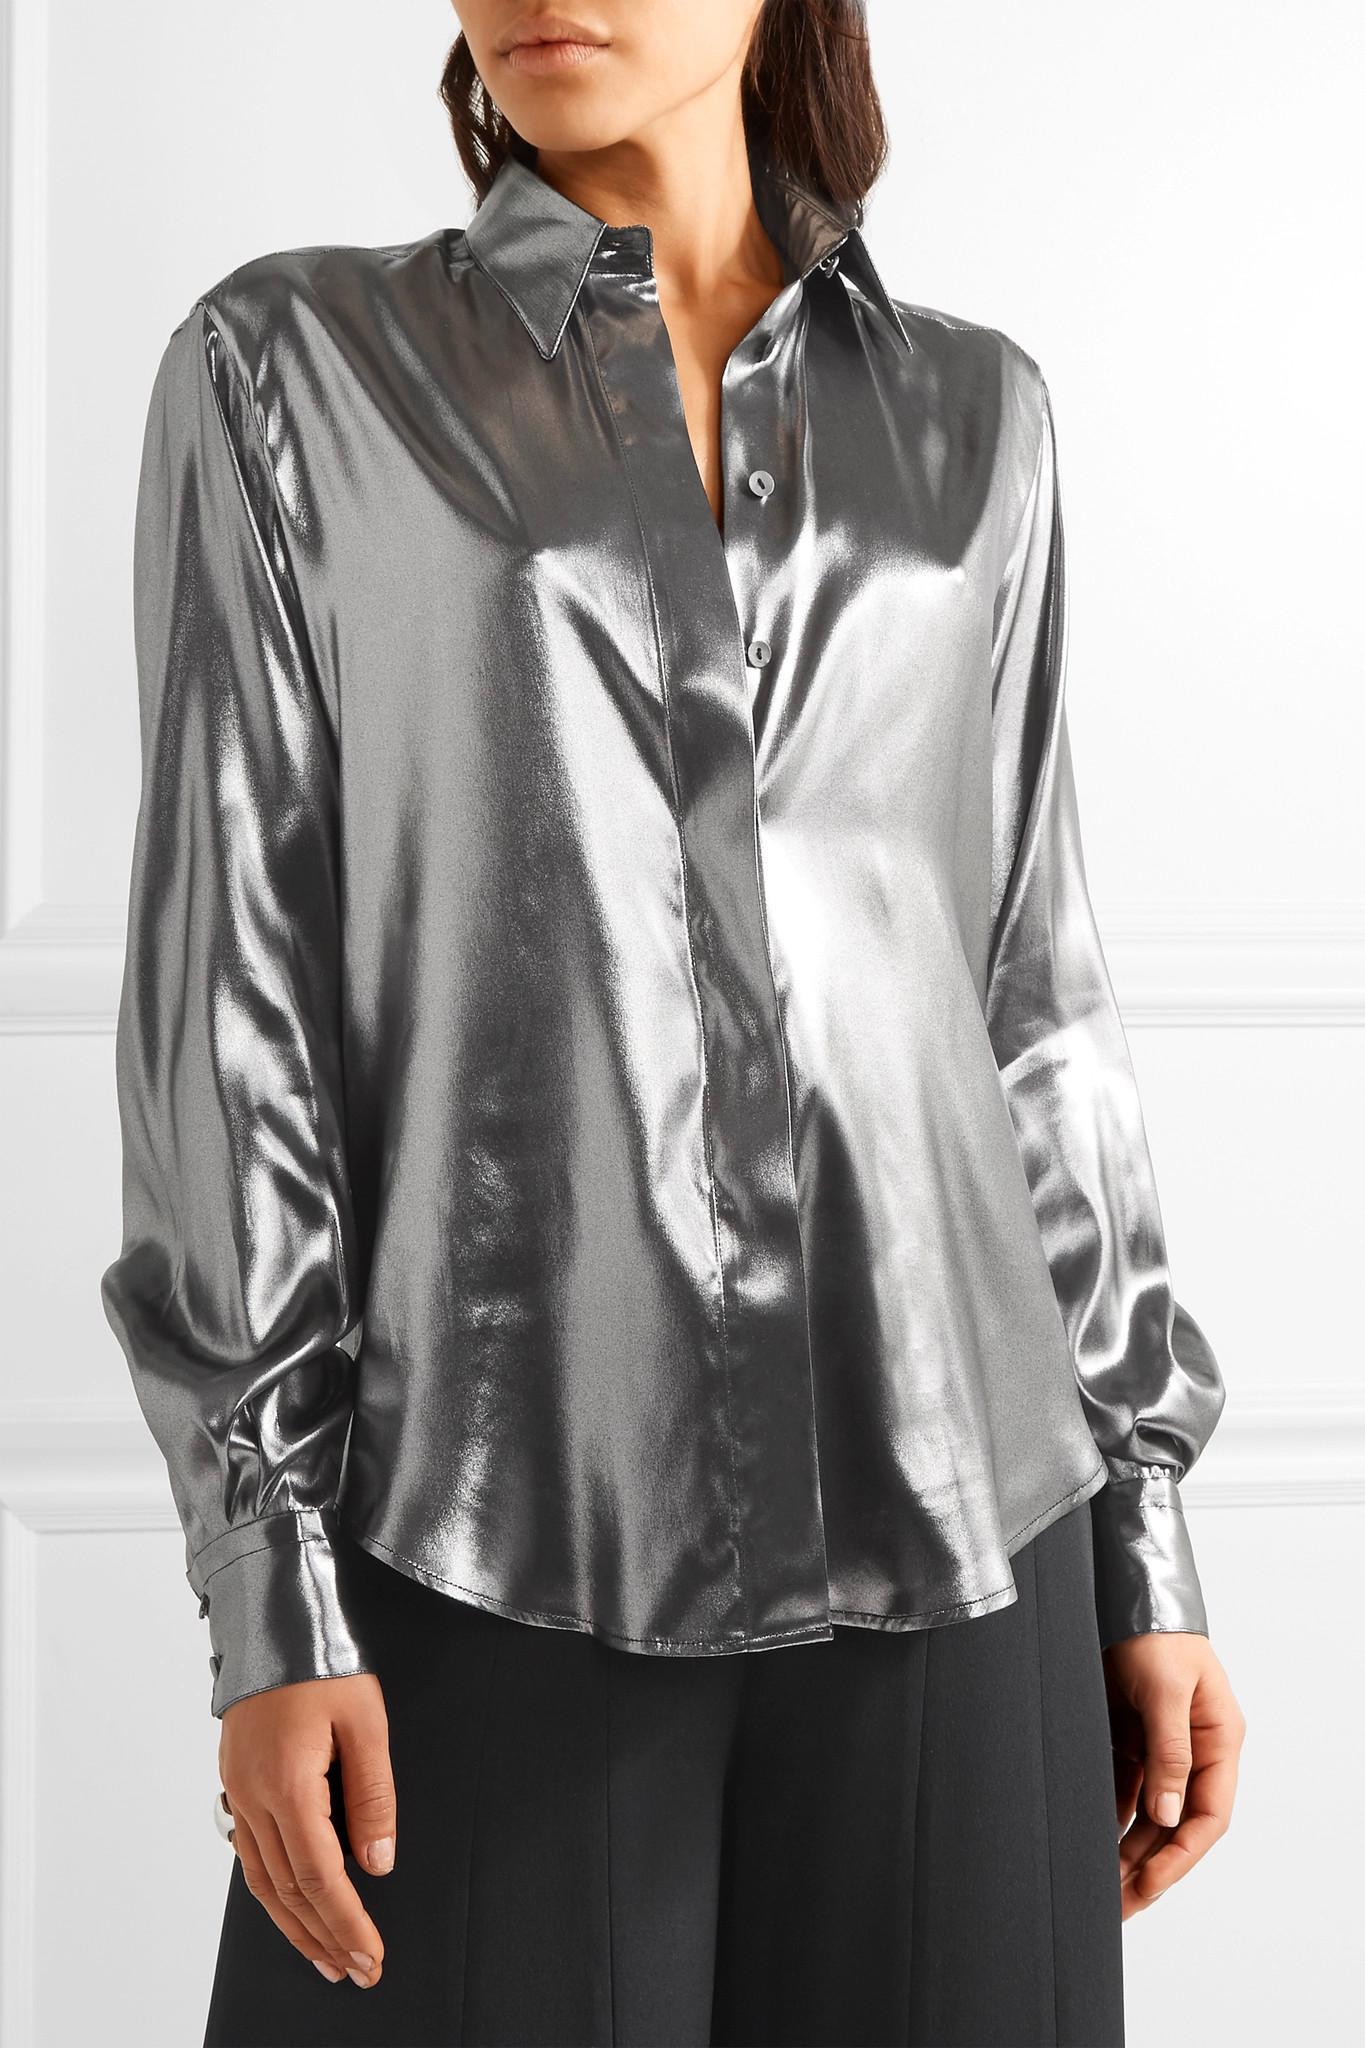 Pallas arianne silk lam shirt in metallic lyst for Silver metallic shirt women s